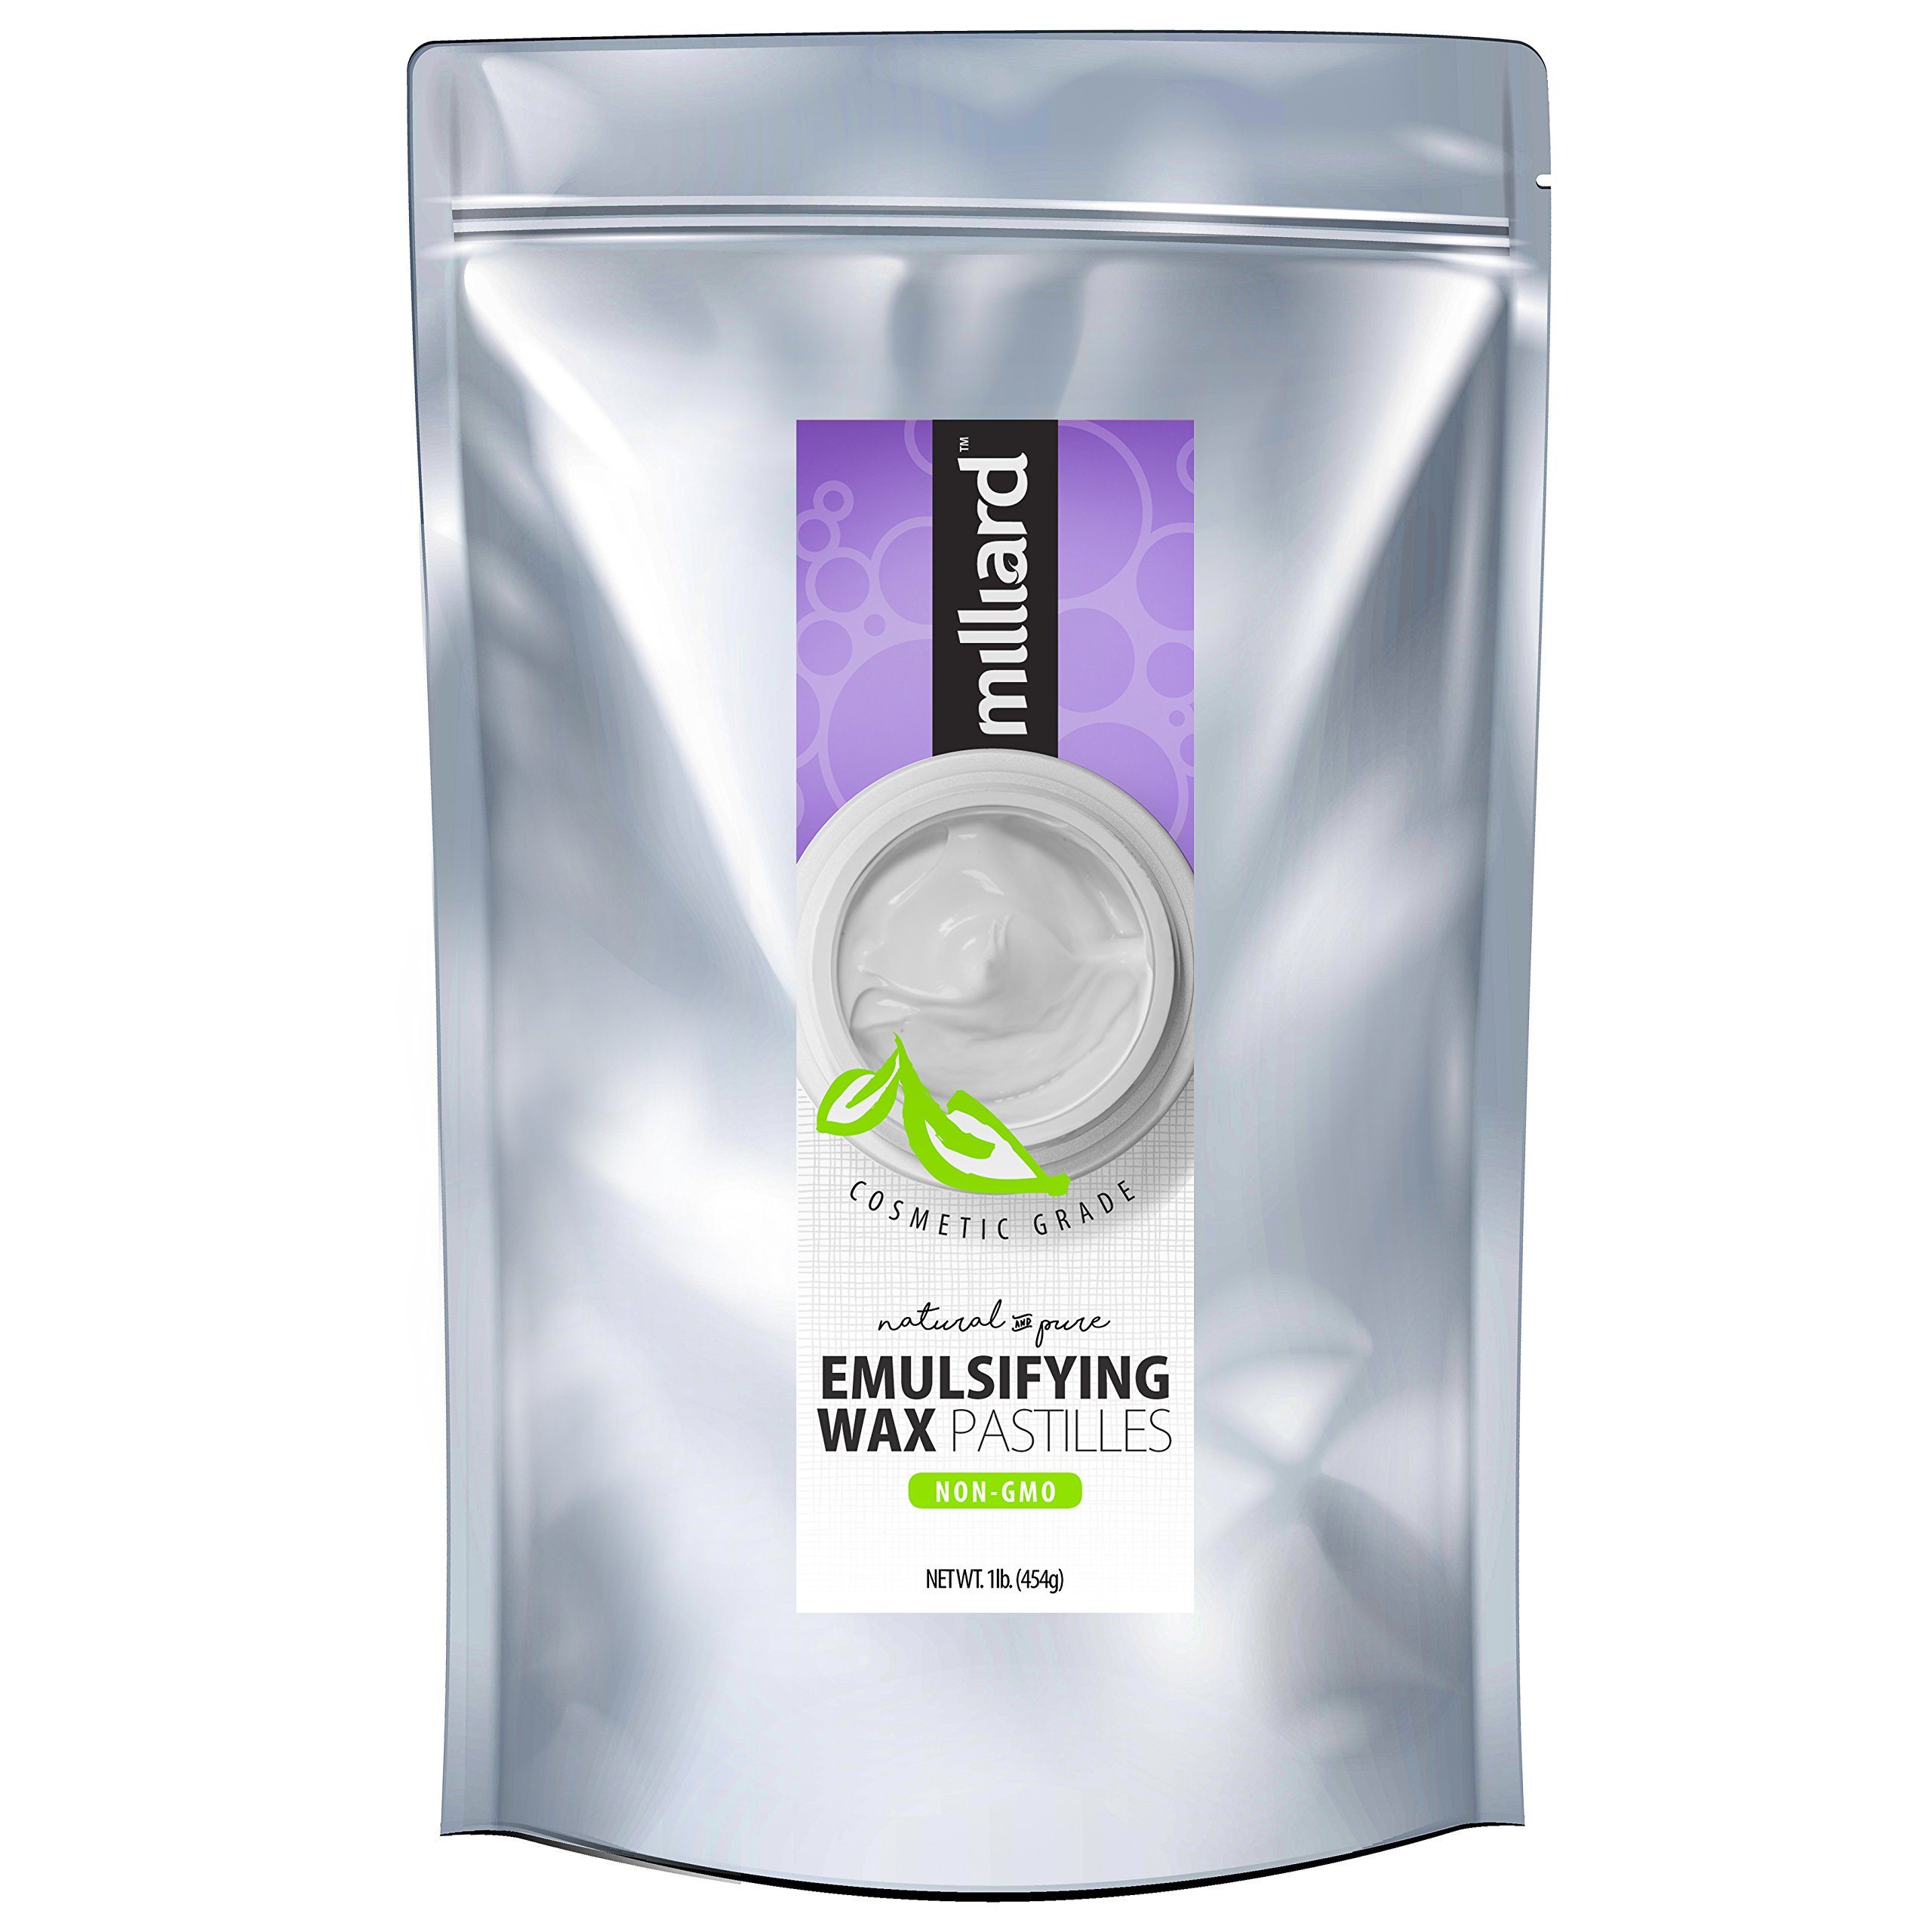 Milliard NON-GMO Emulsifying Wax Pastilles NF –16 OZ. Resealable Freshness Storage Bag